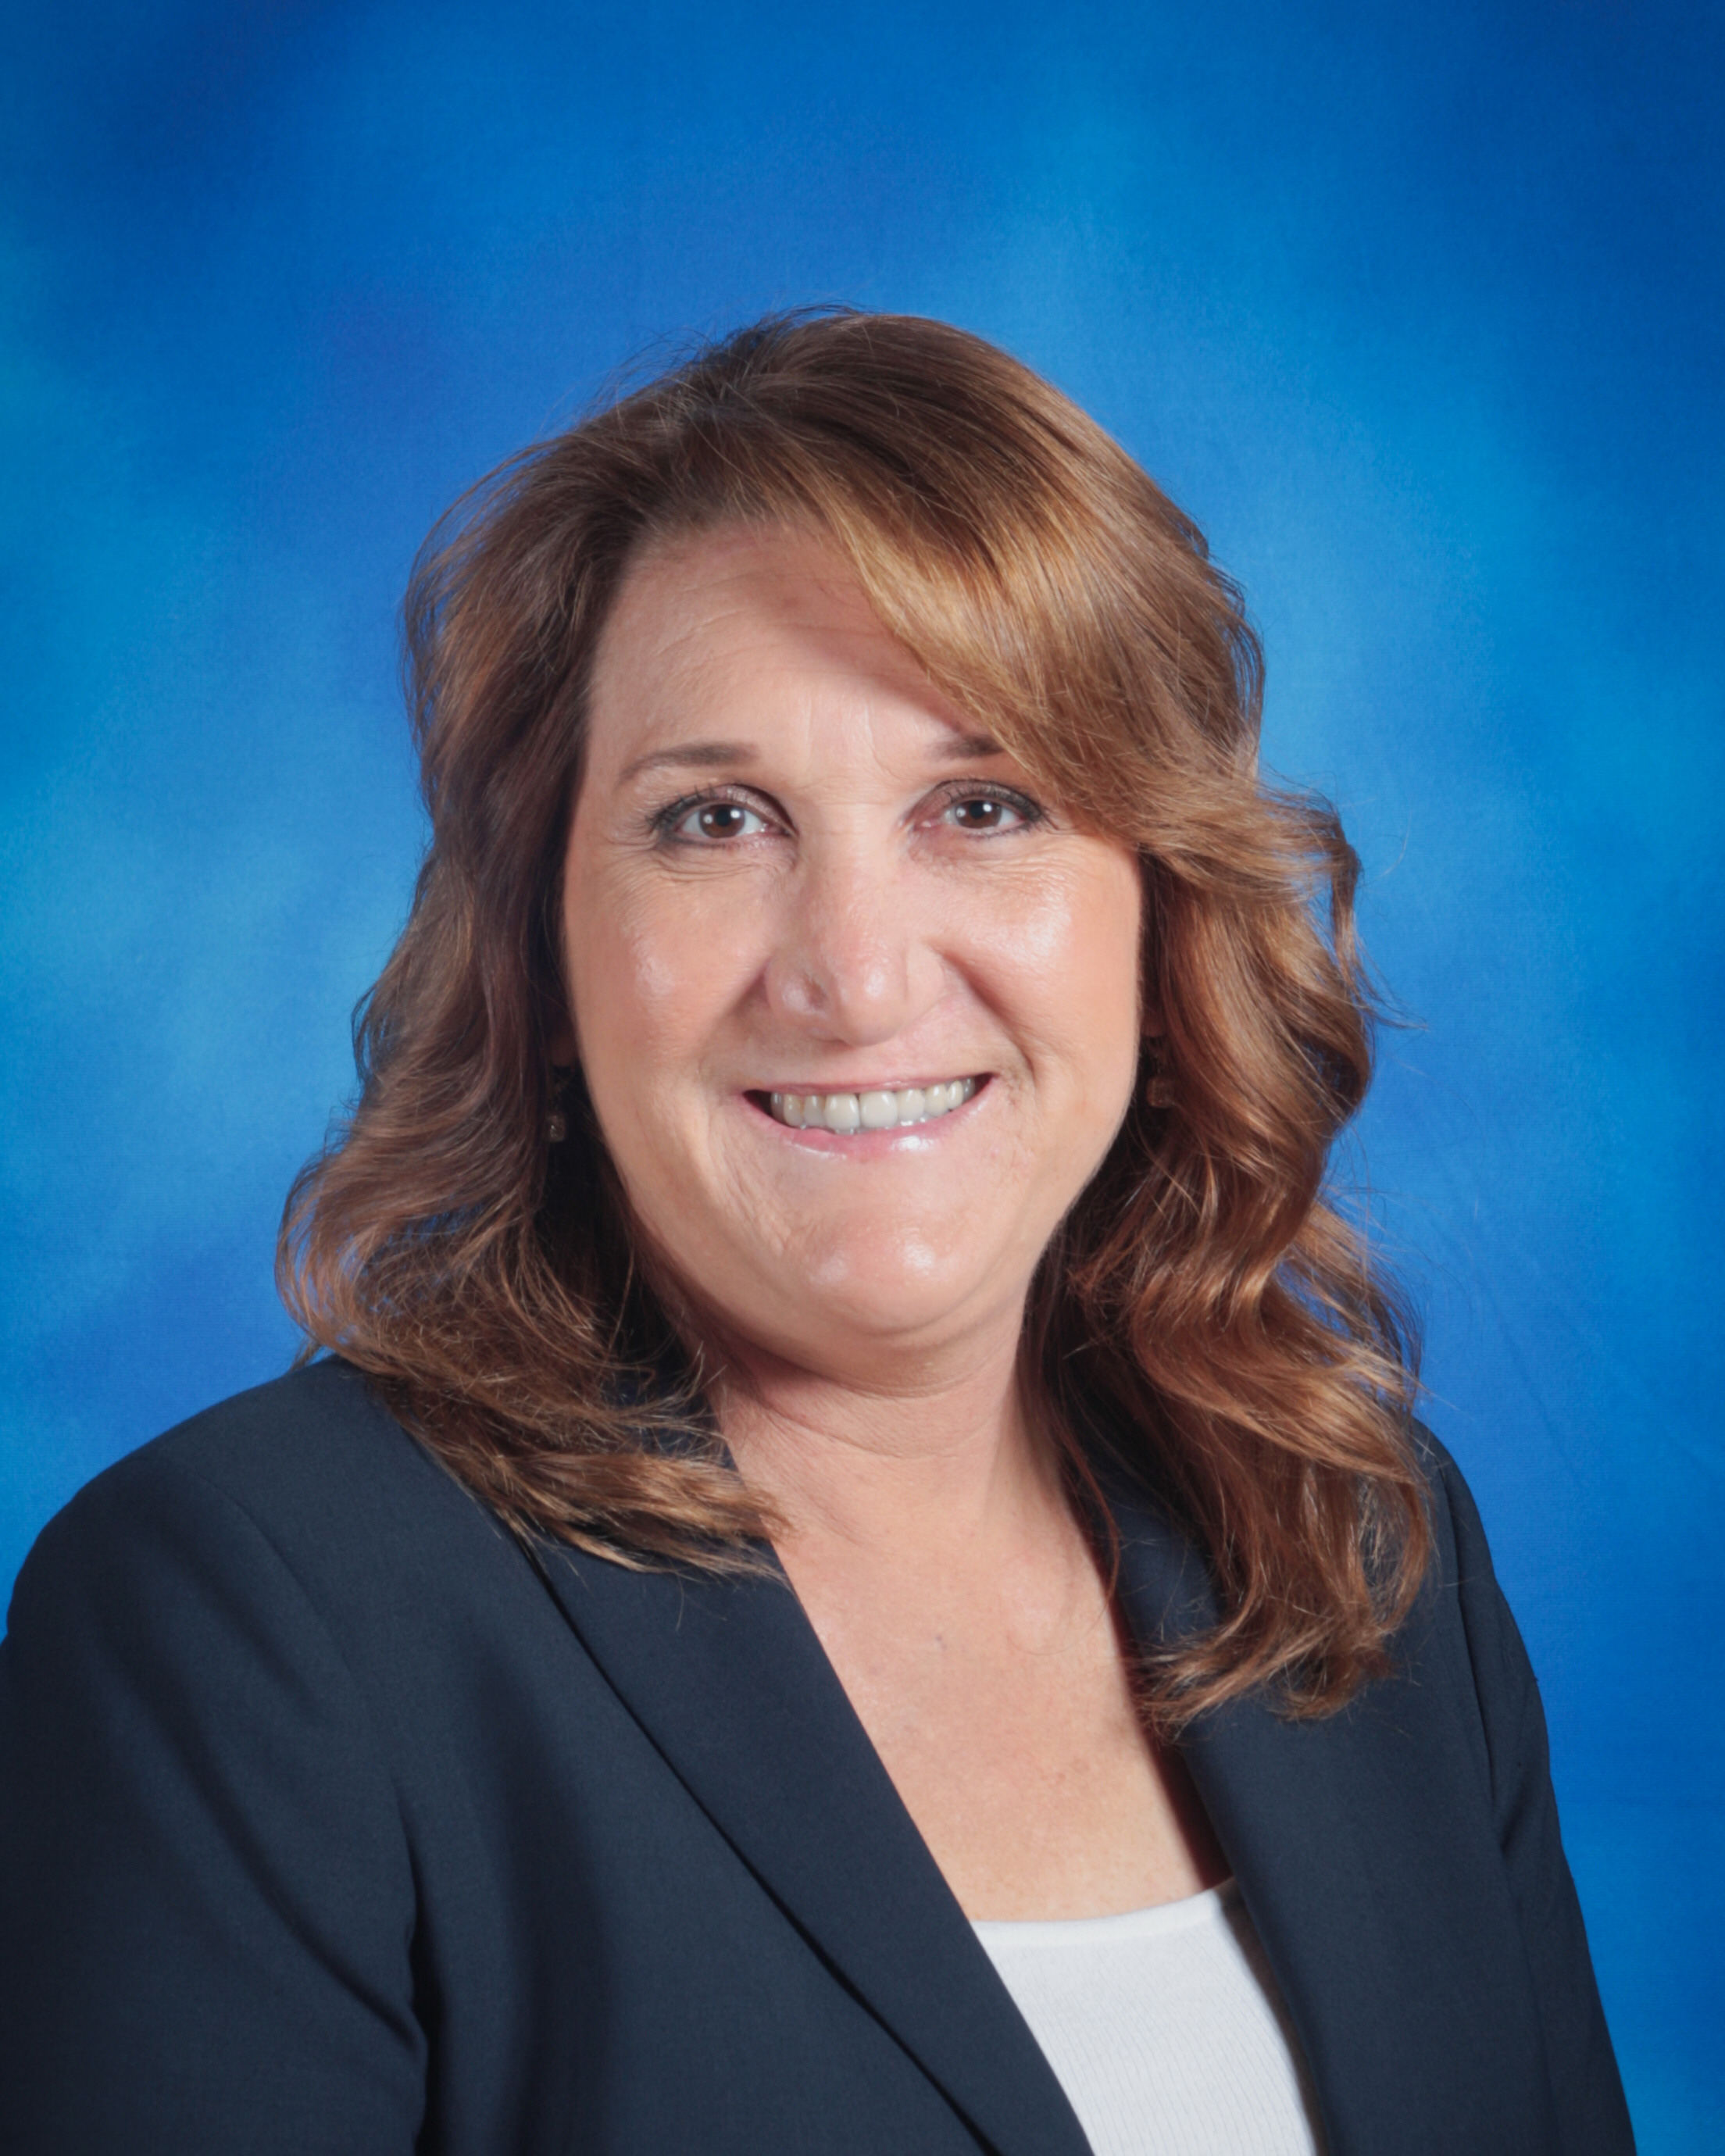 Photo of Cathy Dodd